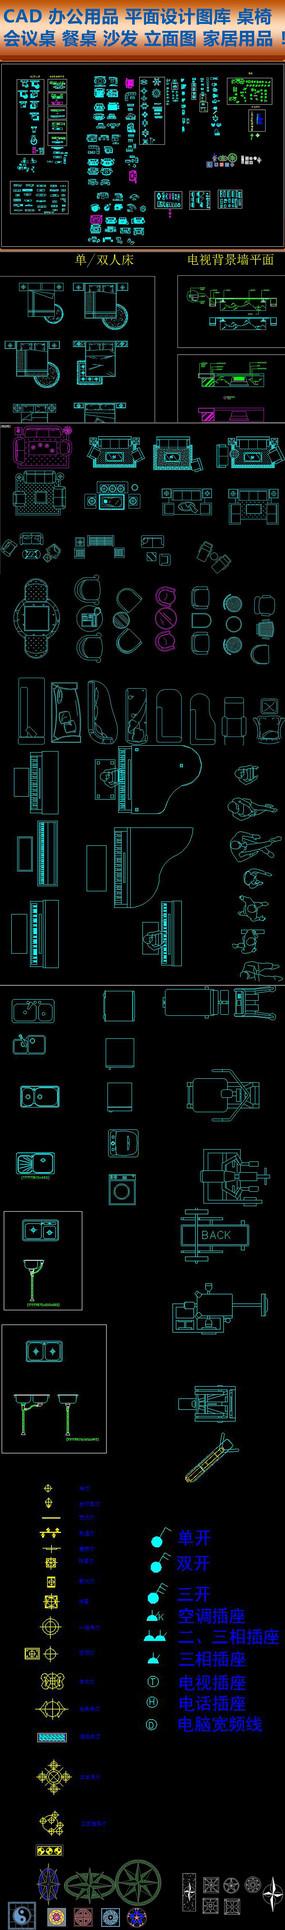 CAD常室内家具家居用品图库